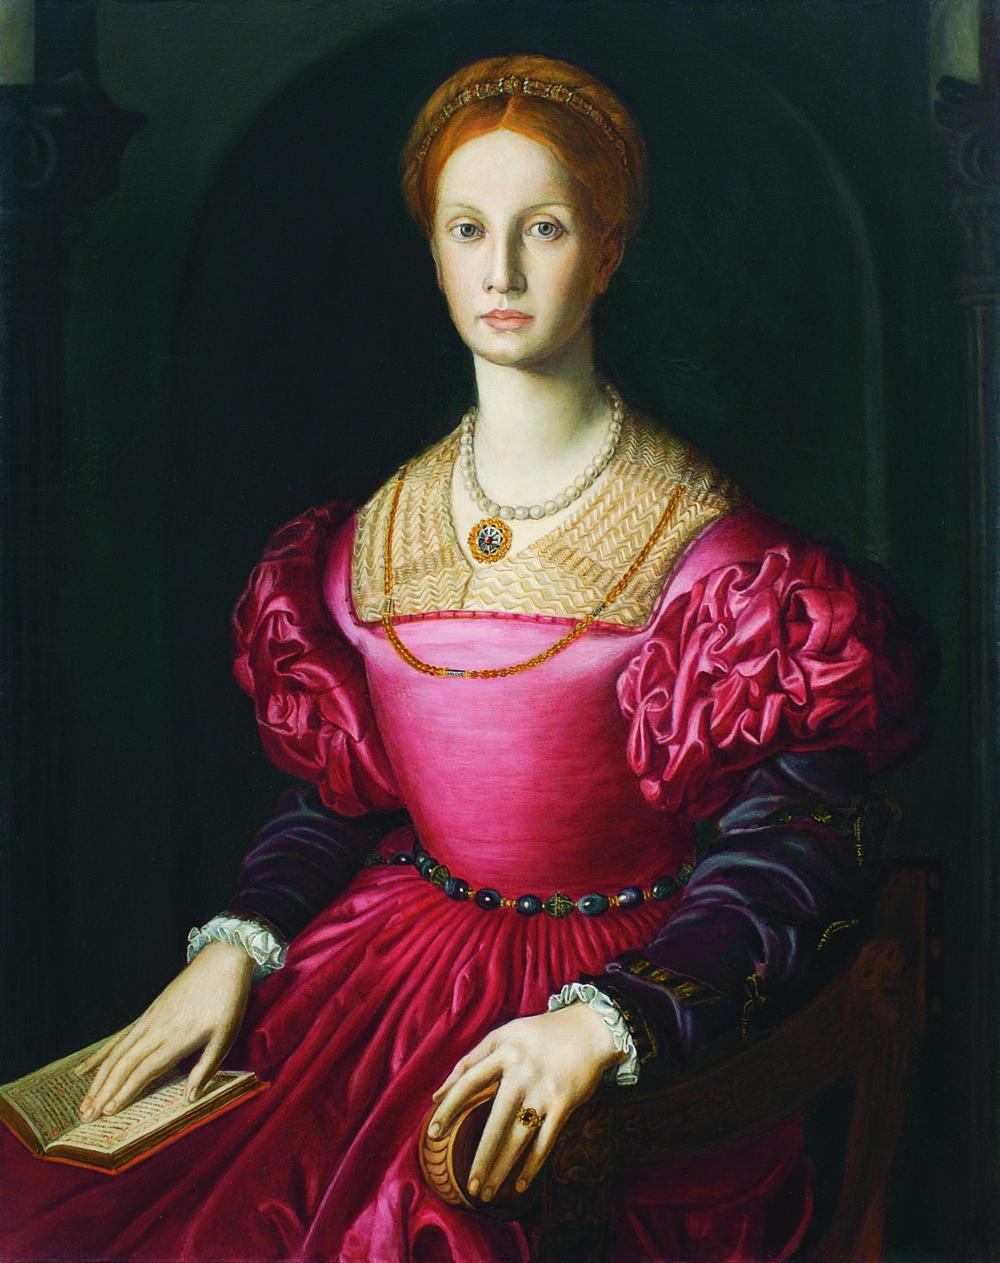 Dorota Filová: Kópia obrazu Bronzina Lucrezia Panciatichi, 2001.